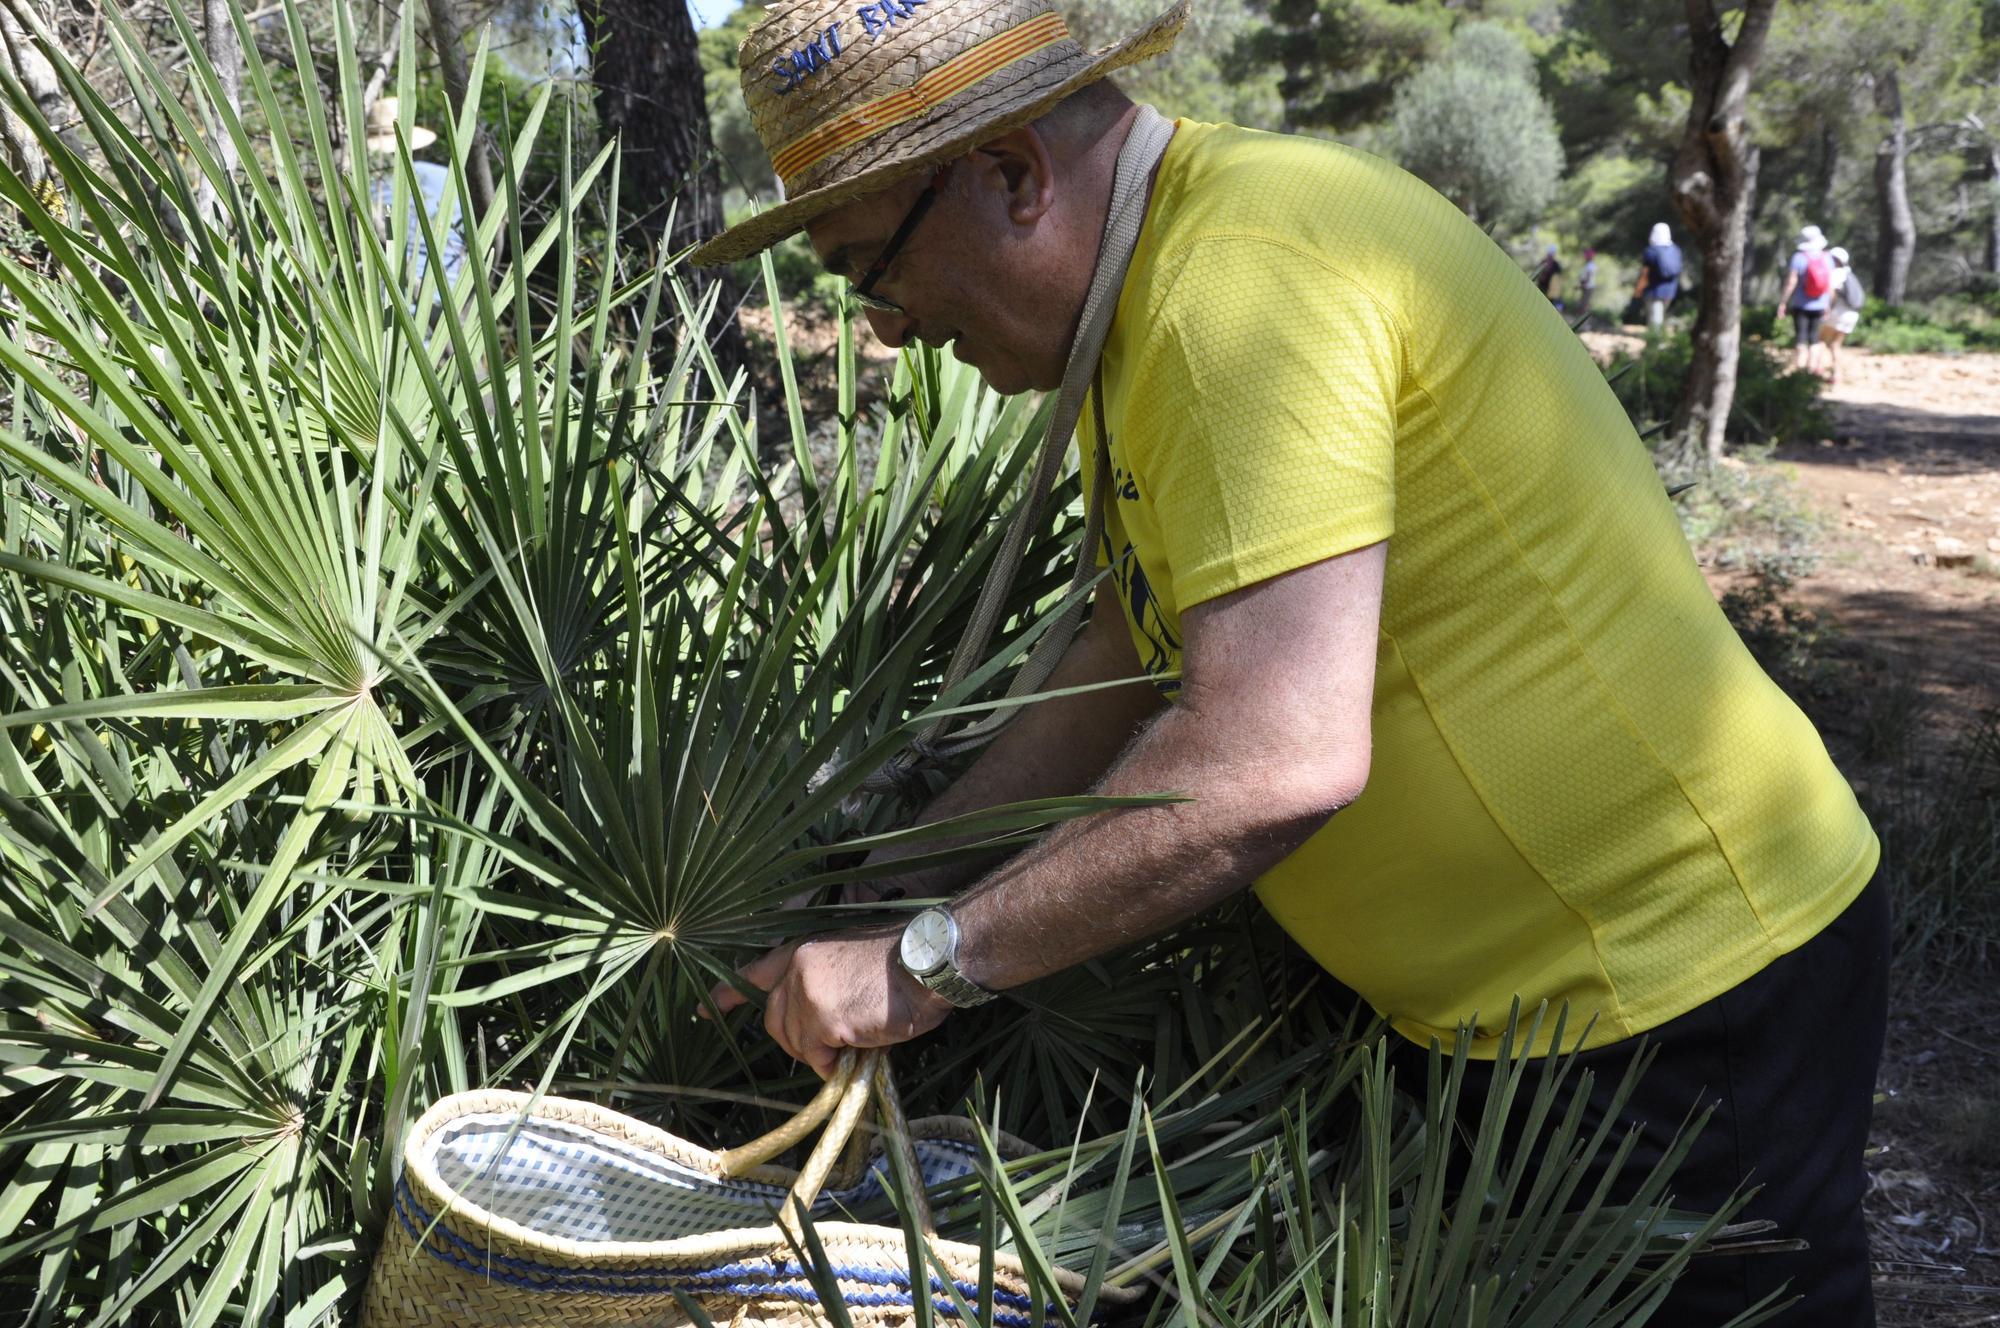 Capdepera recolecta 100 kilos de palmito para las 'Madones de la llata'